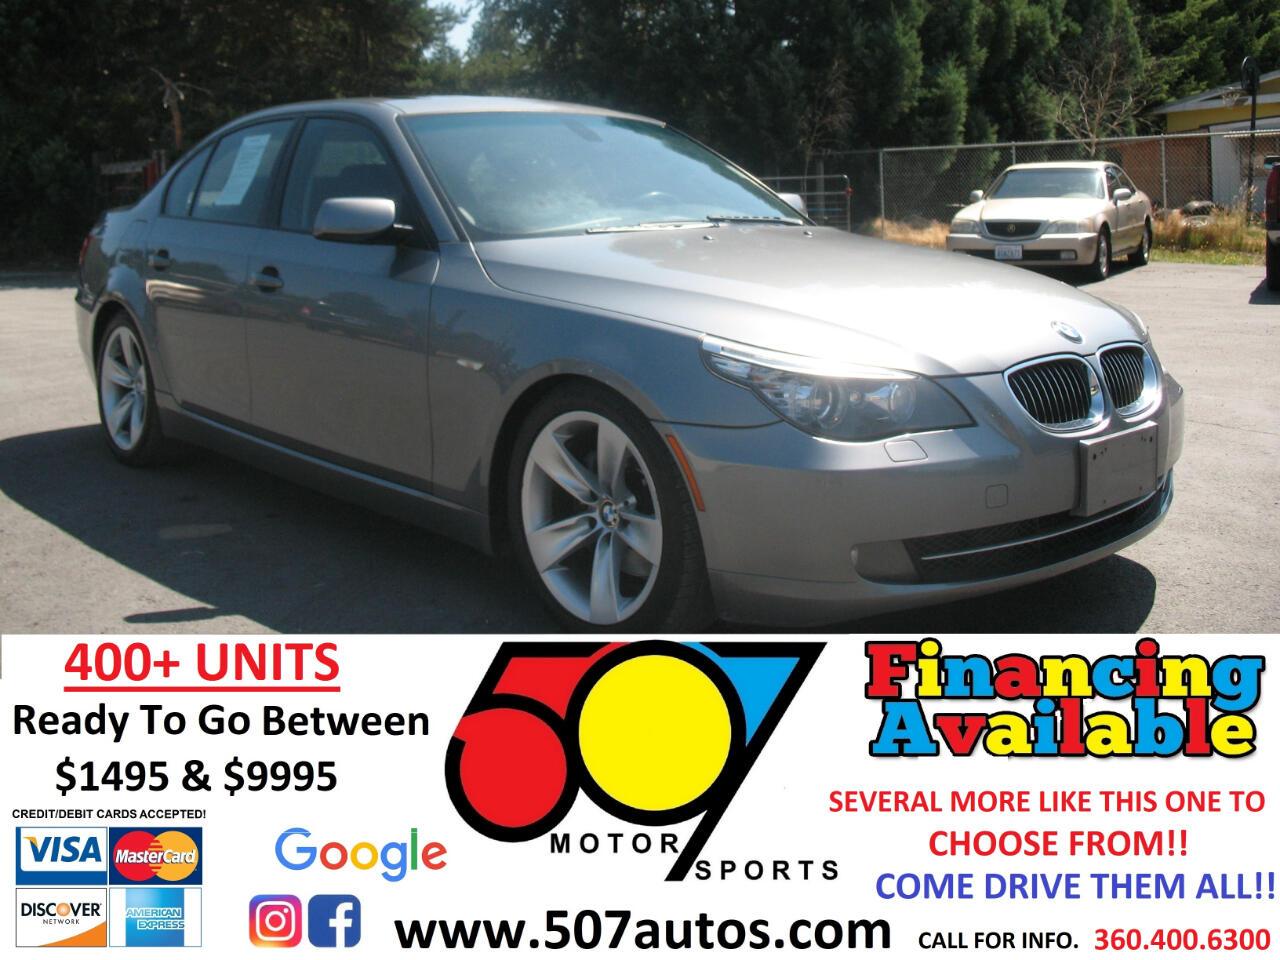 BMW 5 Series 4dr Sdn 528i RWD 2008